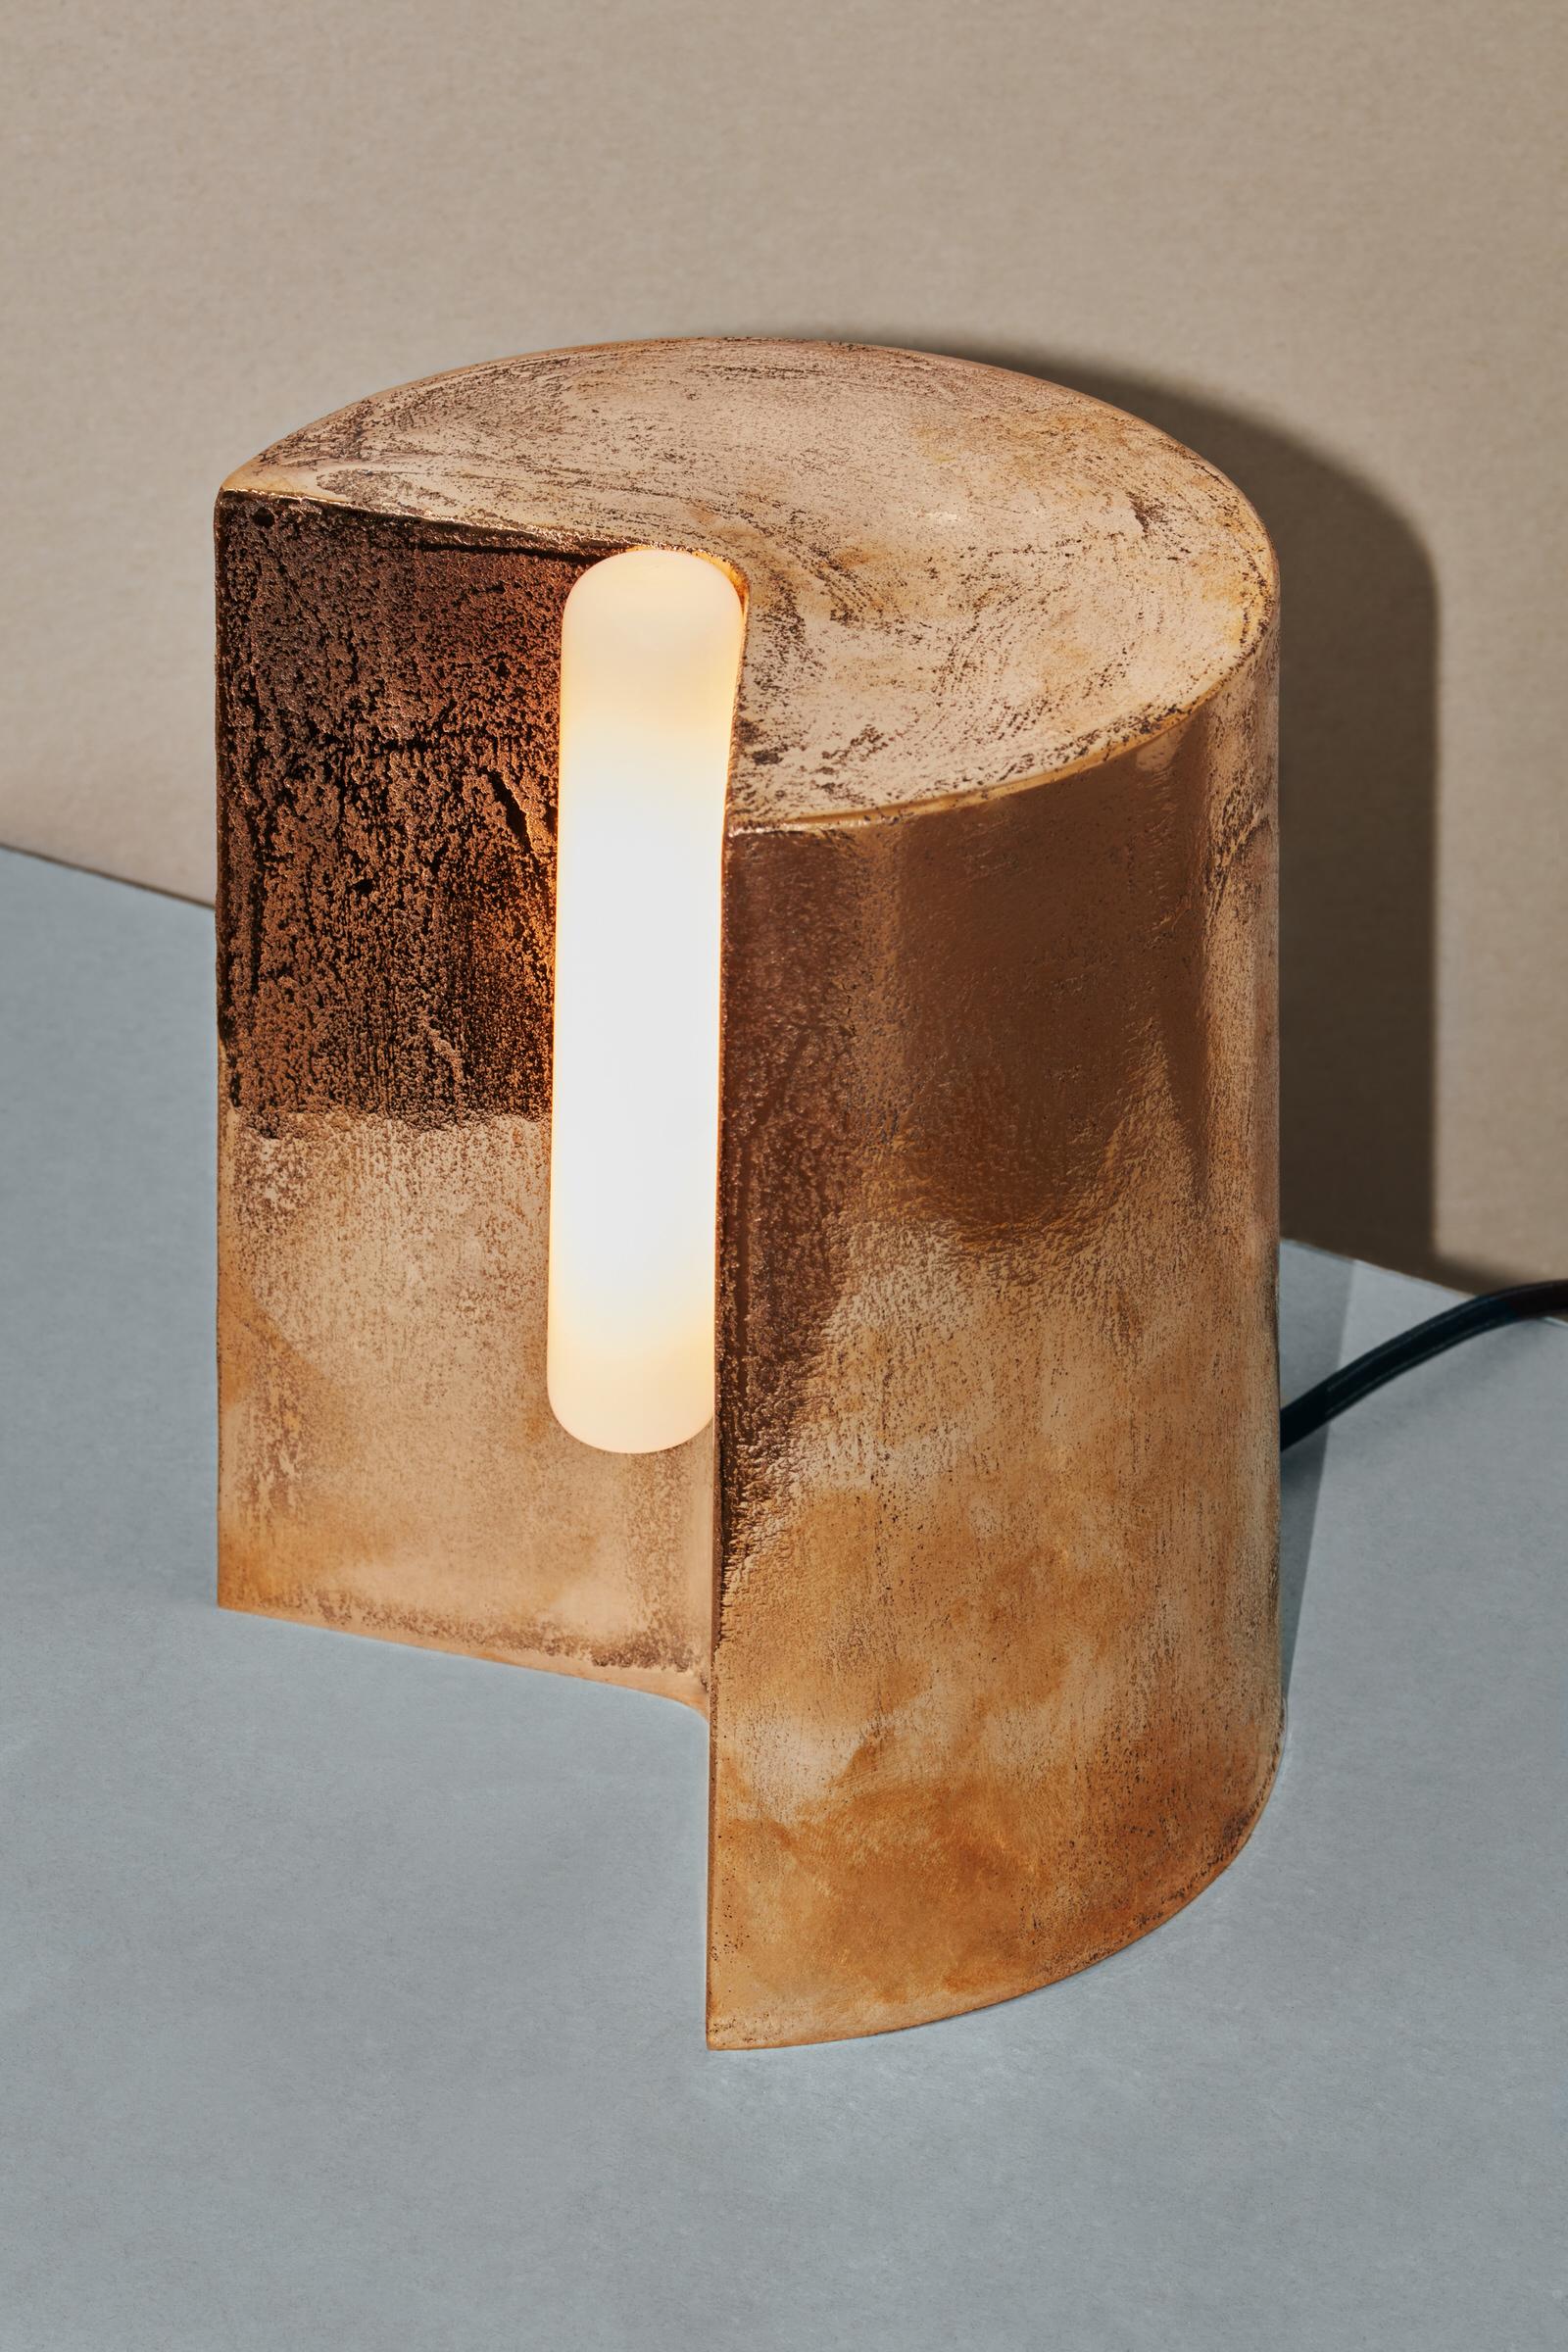 Volker Haug Studio Tableton Lamp Collection Styling Marsha Golemac Photo Morgan Hickinbotham Yellowtrace 05